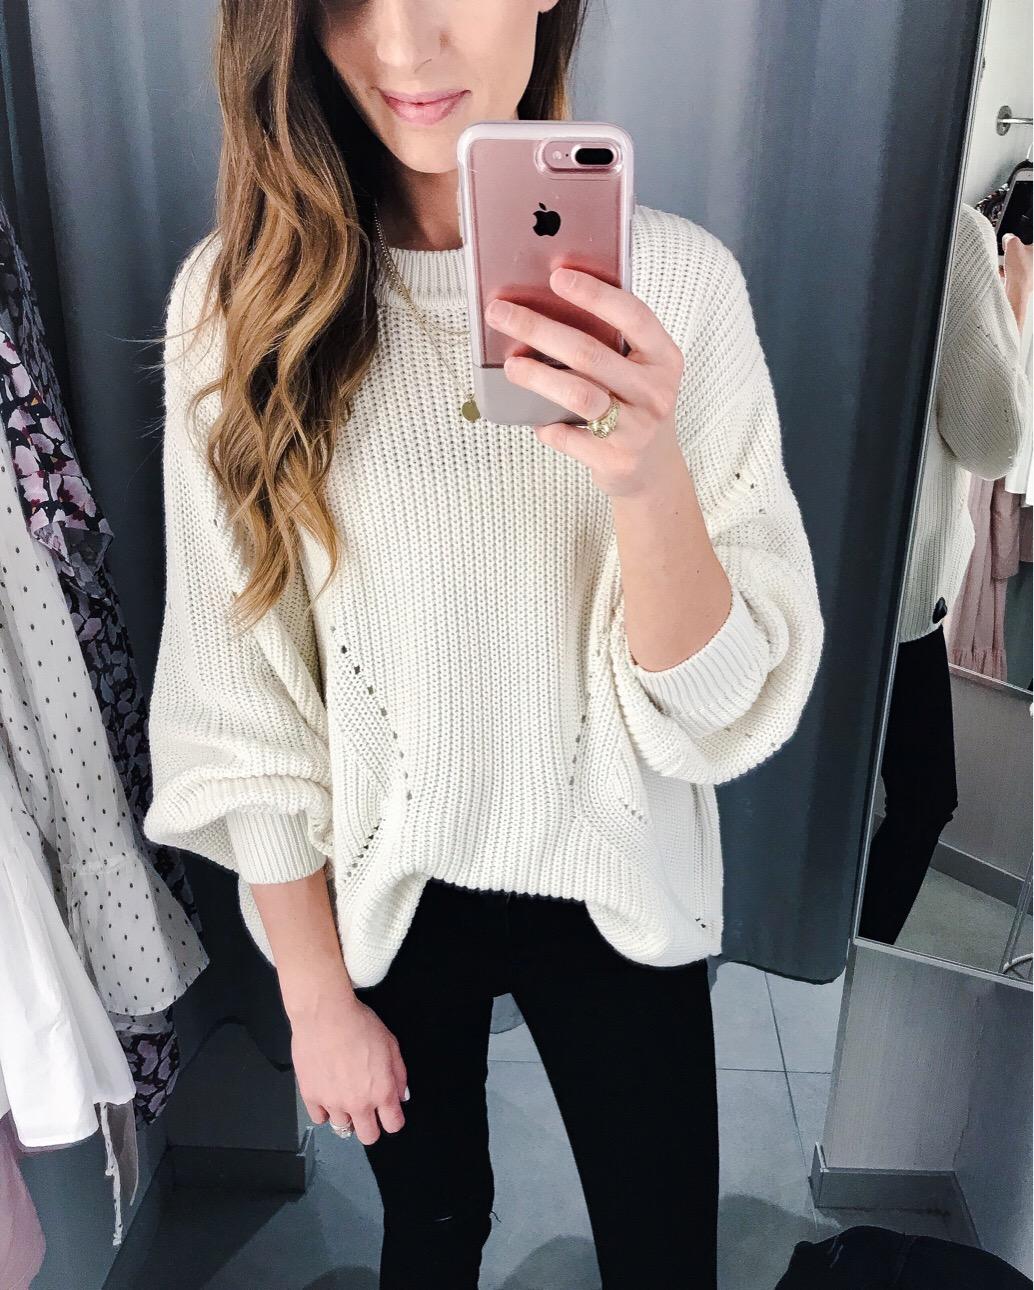 White Knit Sweater - Megan Kristine Blog